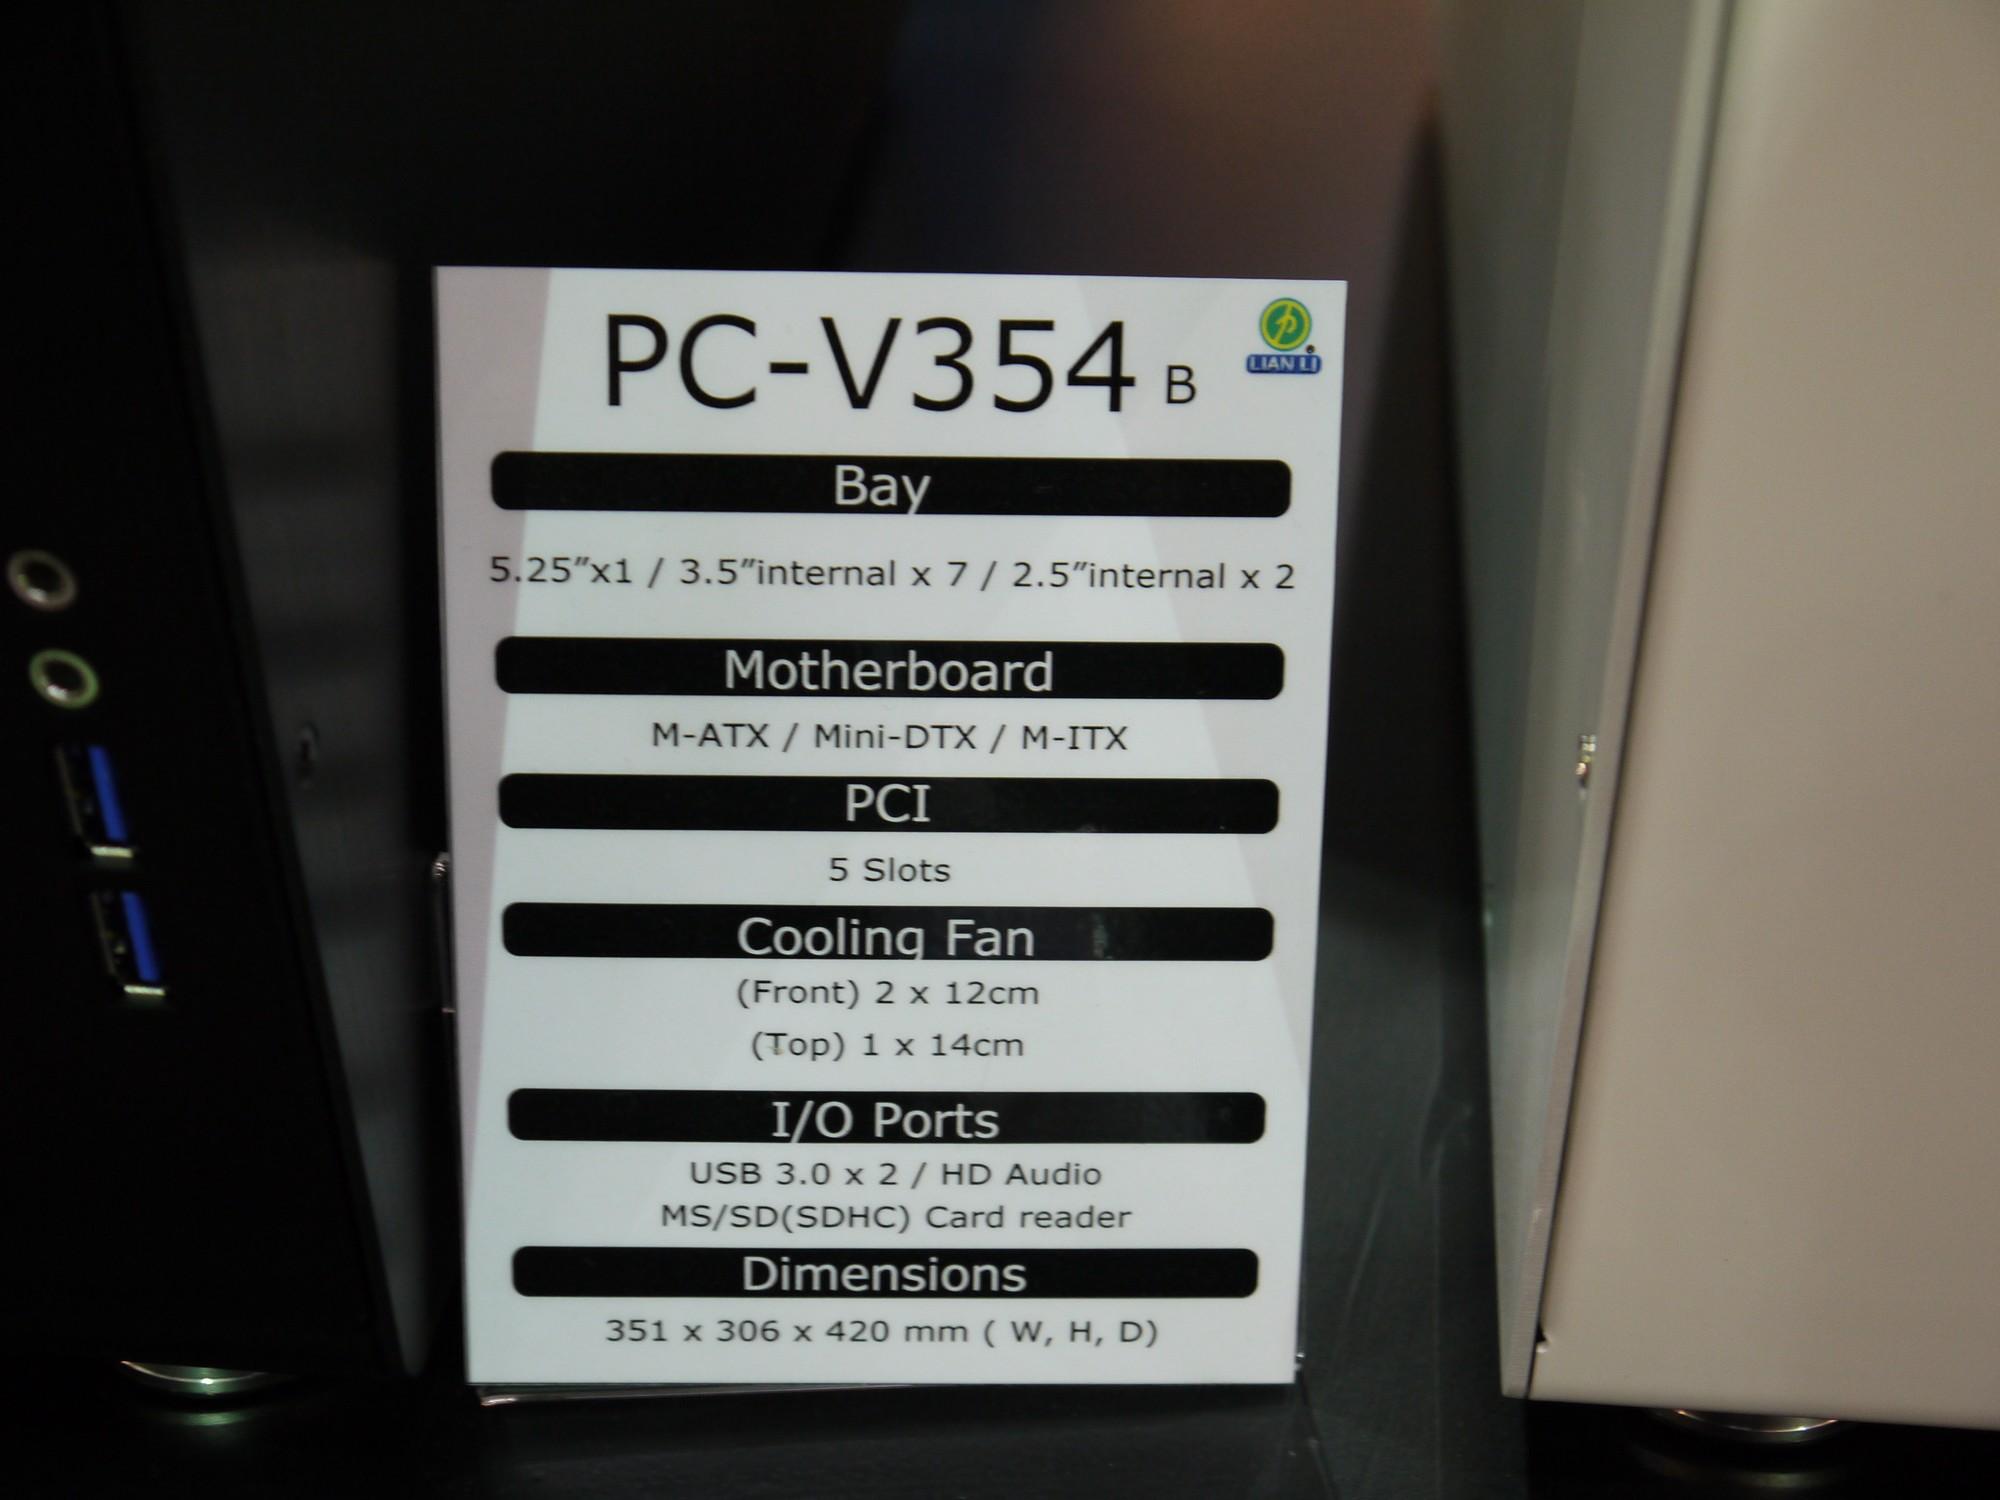 P1020759.JPG